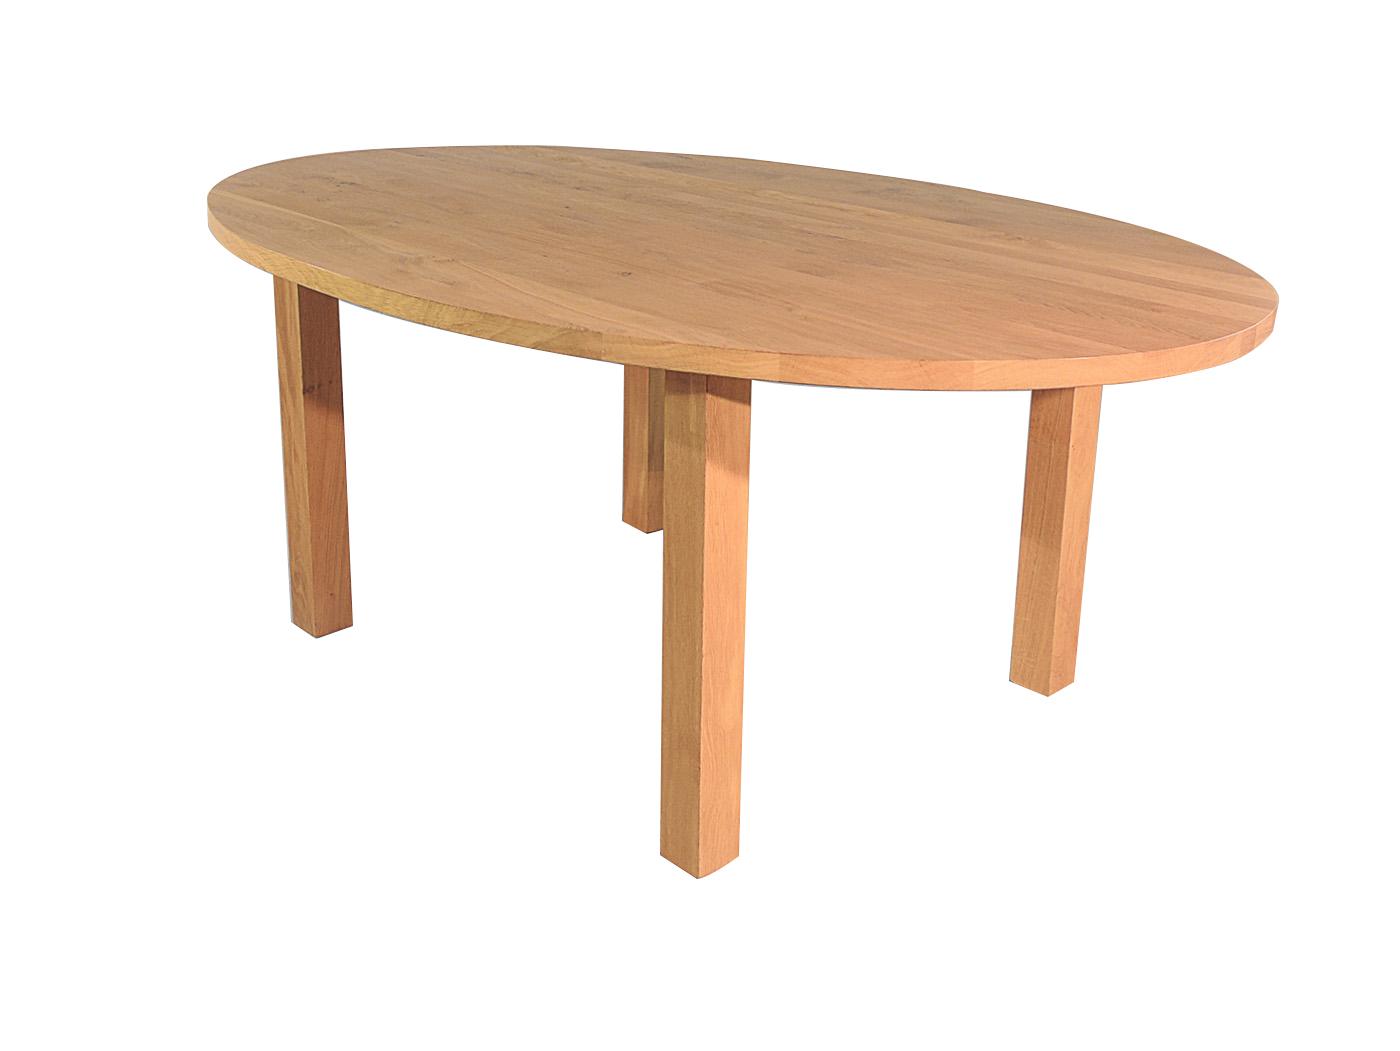 Caen ovale houten eettafel